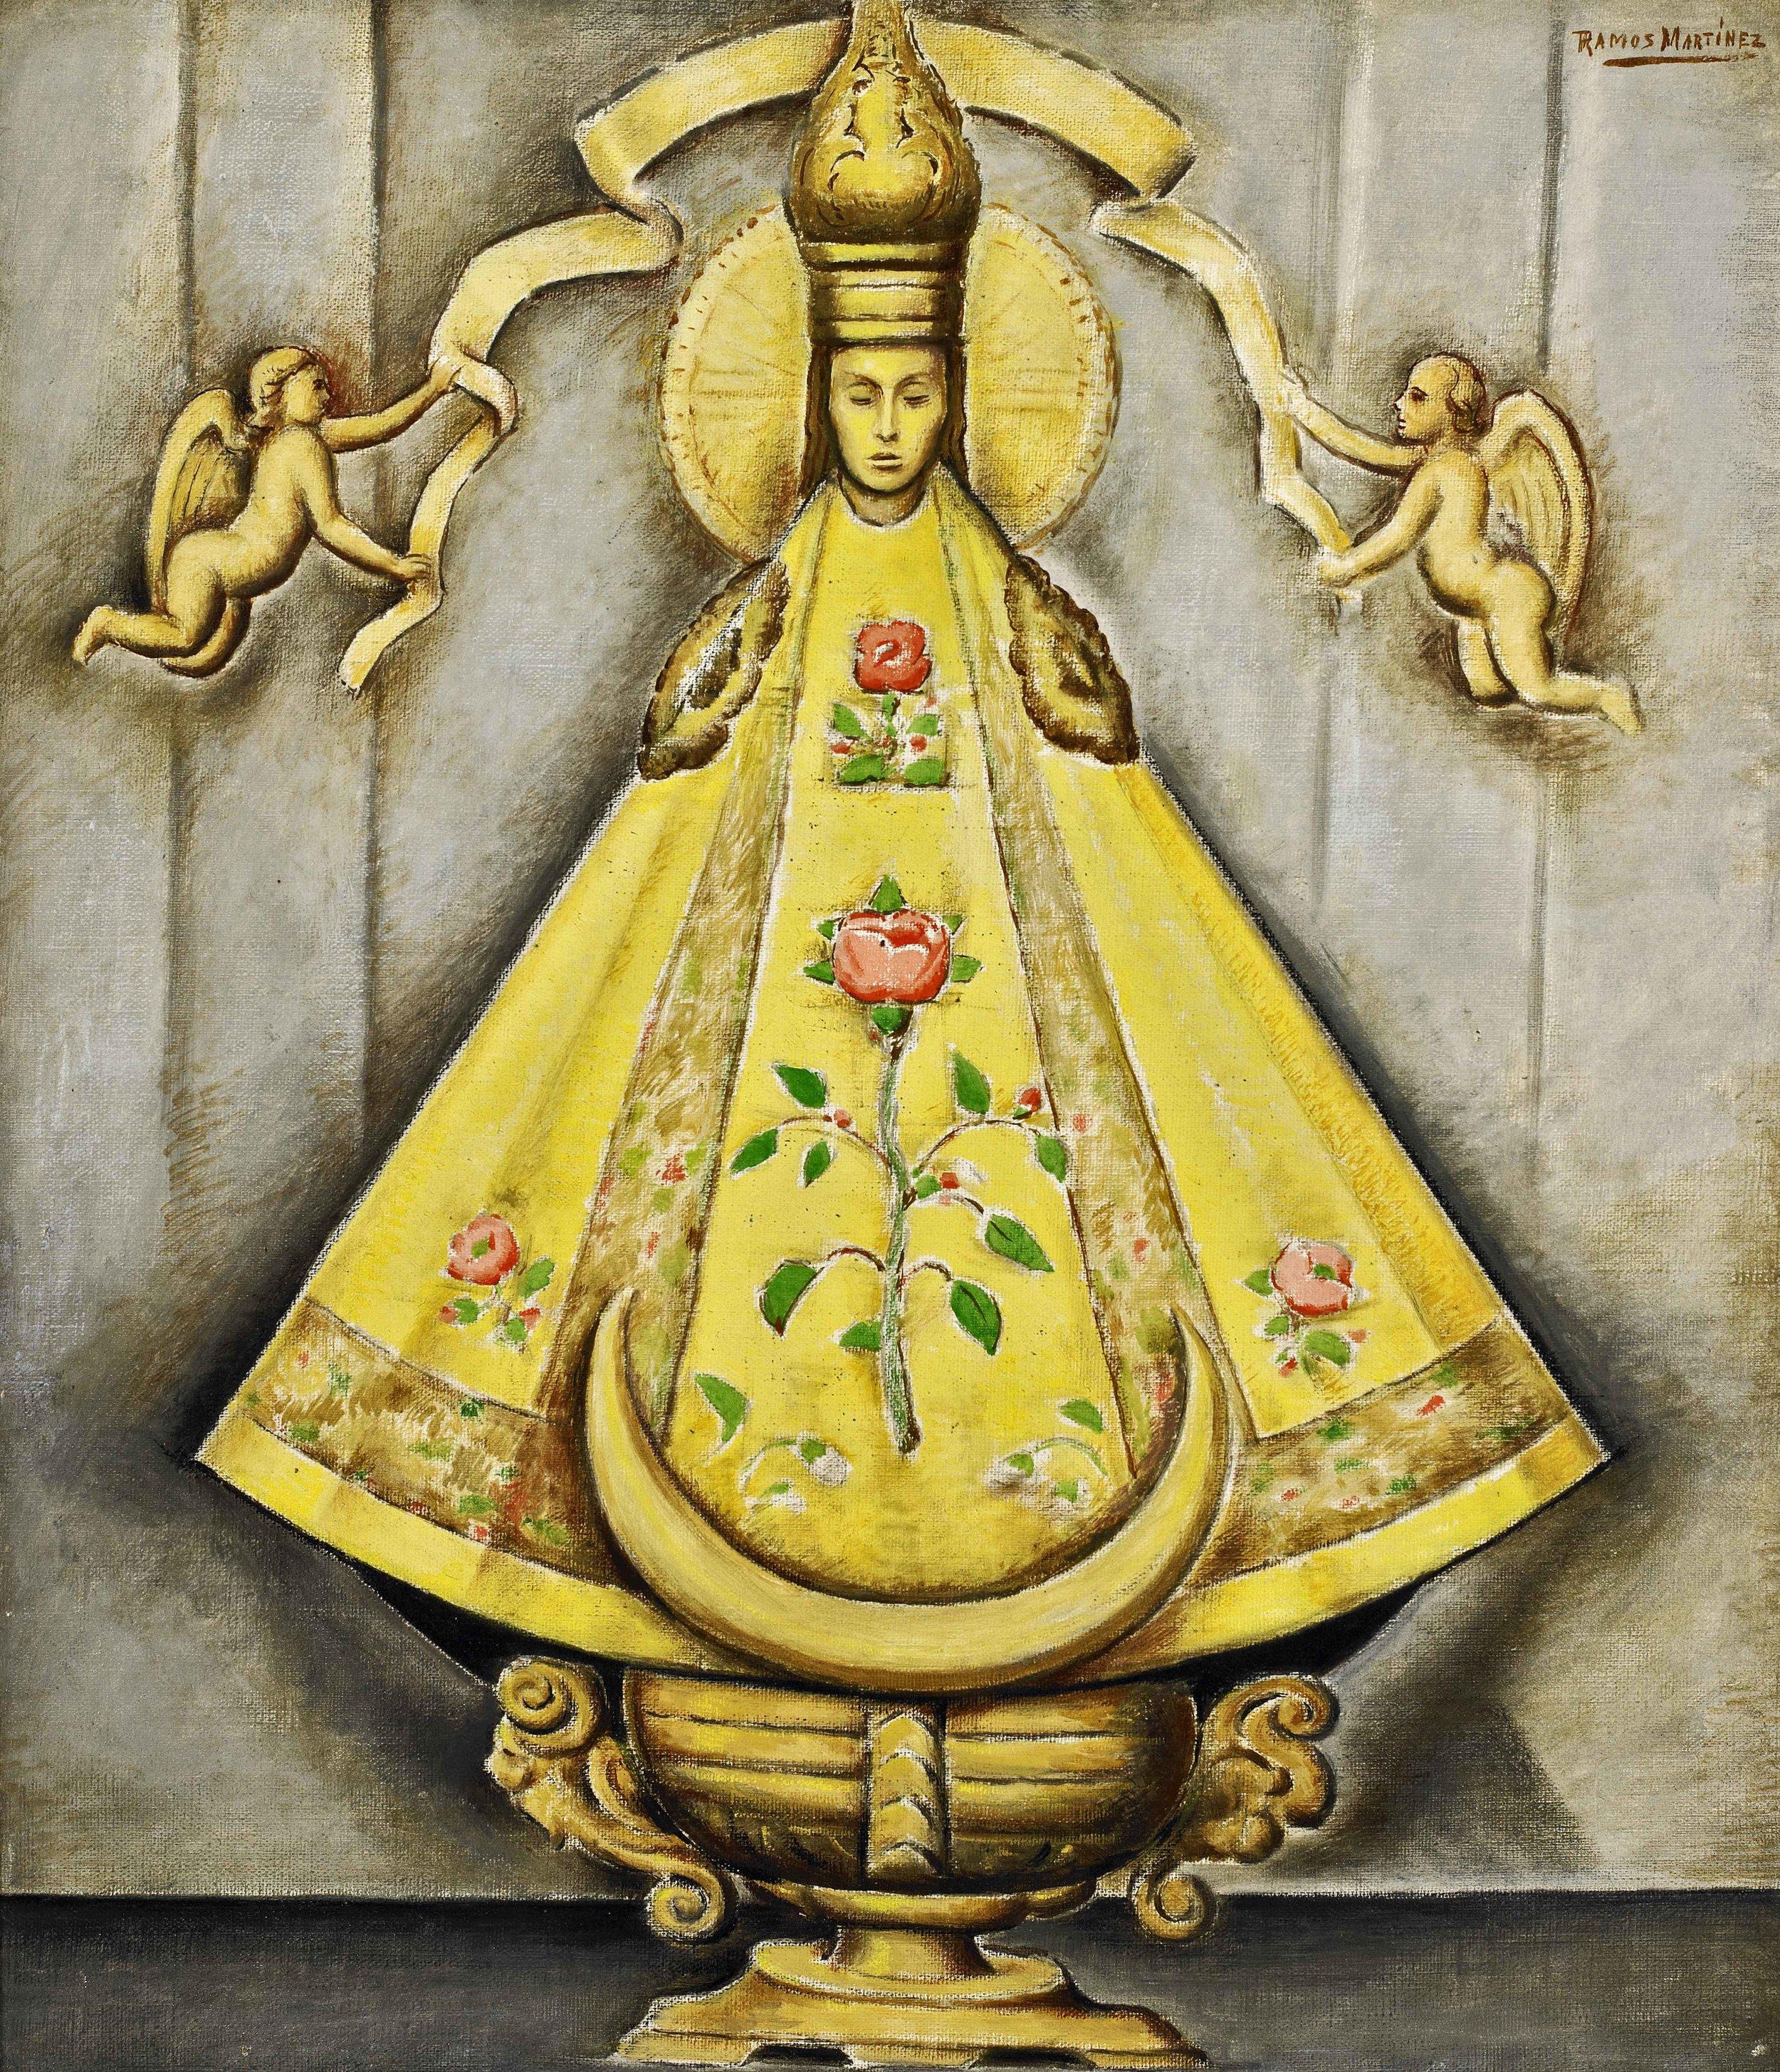 La Madonna Mexicana / Mexican Madonna  ca. 1940 oil on canvas / óleo sobre tela 26 x 22 inches; 66 x 55.9 centímetros Private collection